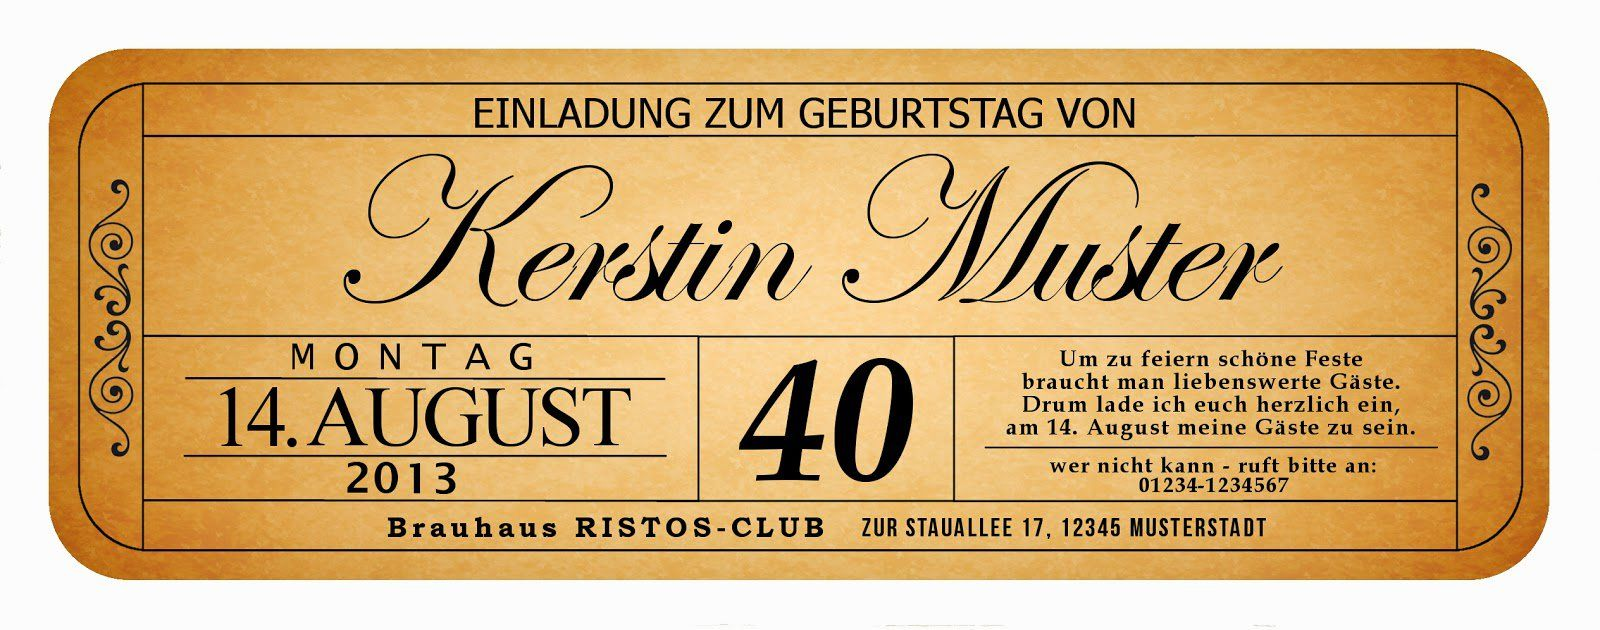 Einladung Geburtstag : 40 Geburtstag Einladung   Geburstag Einladungskarten    Geburstag Einladungskarten